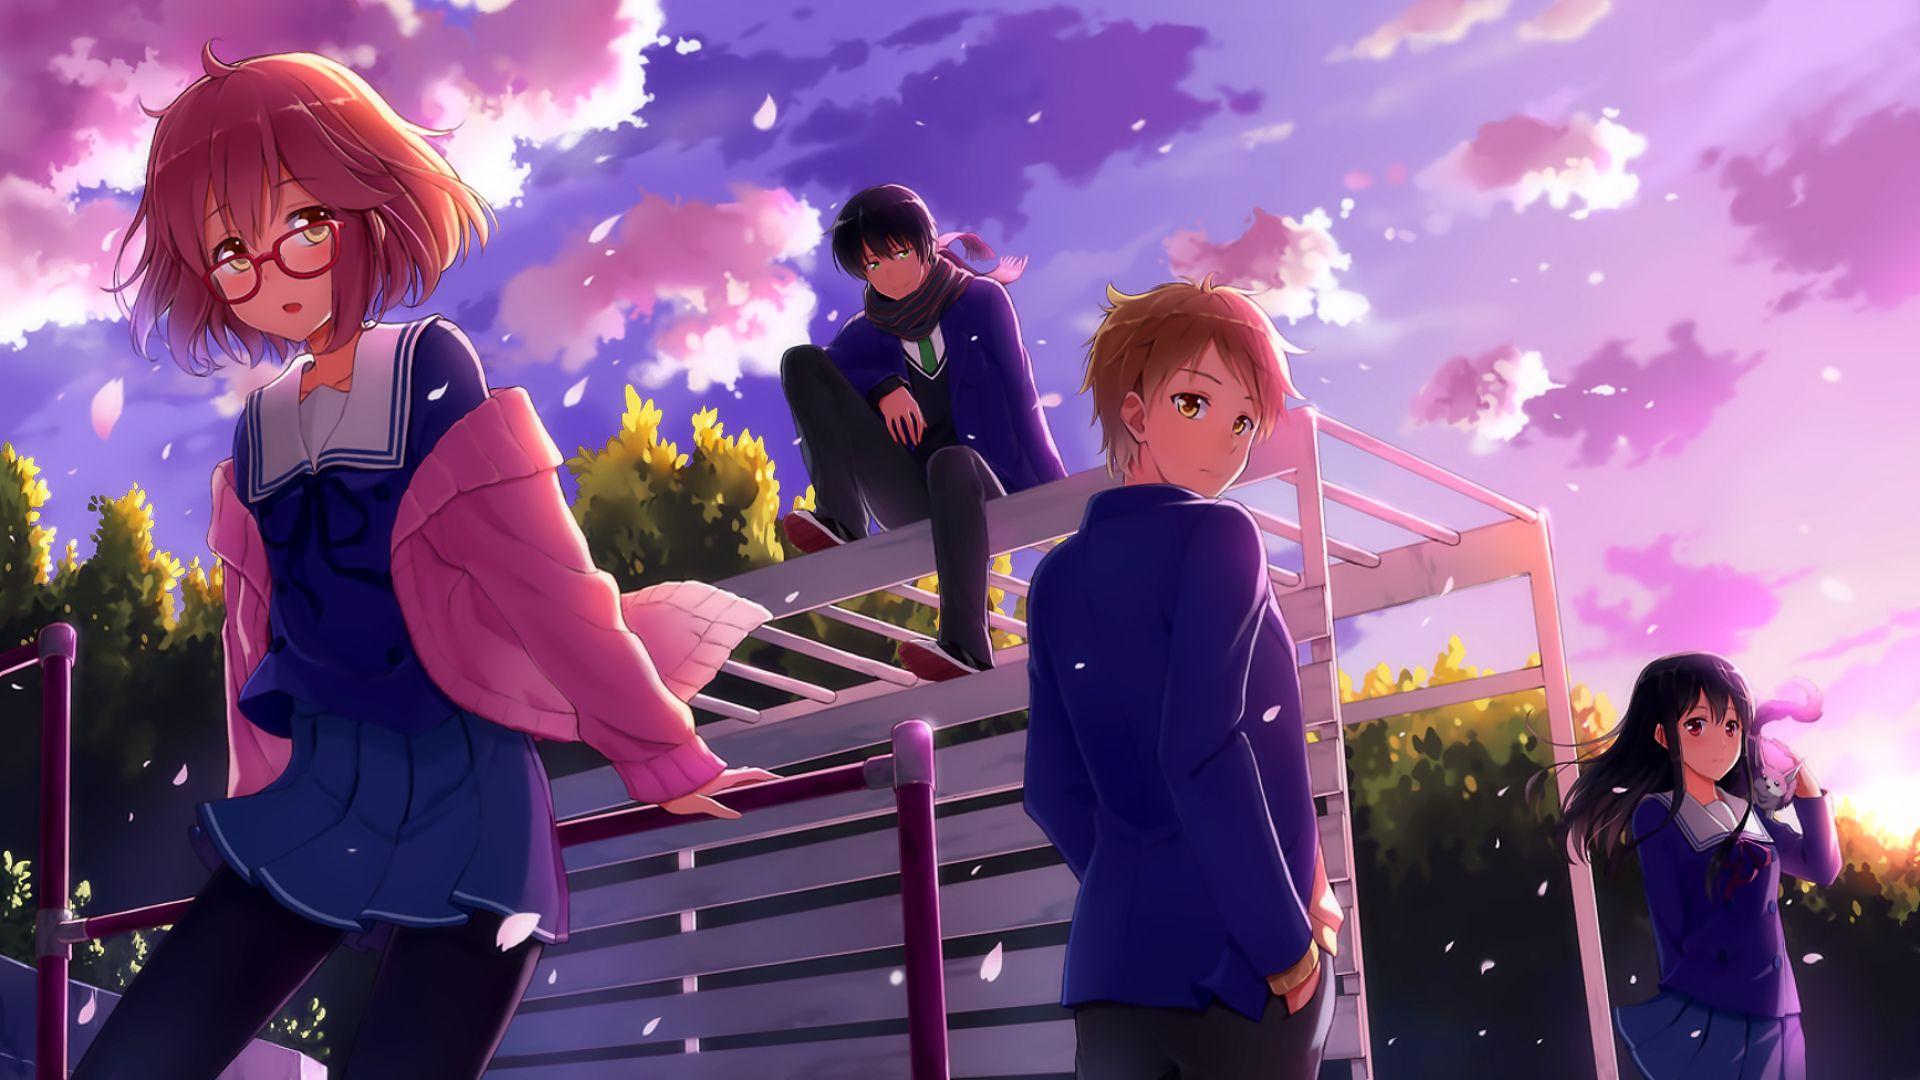 ~Wallpaper Anime~ C83a6ae88439bc1443ba40ef64cc585b